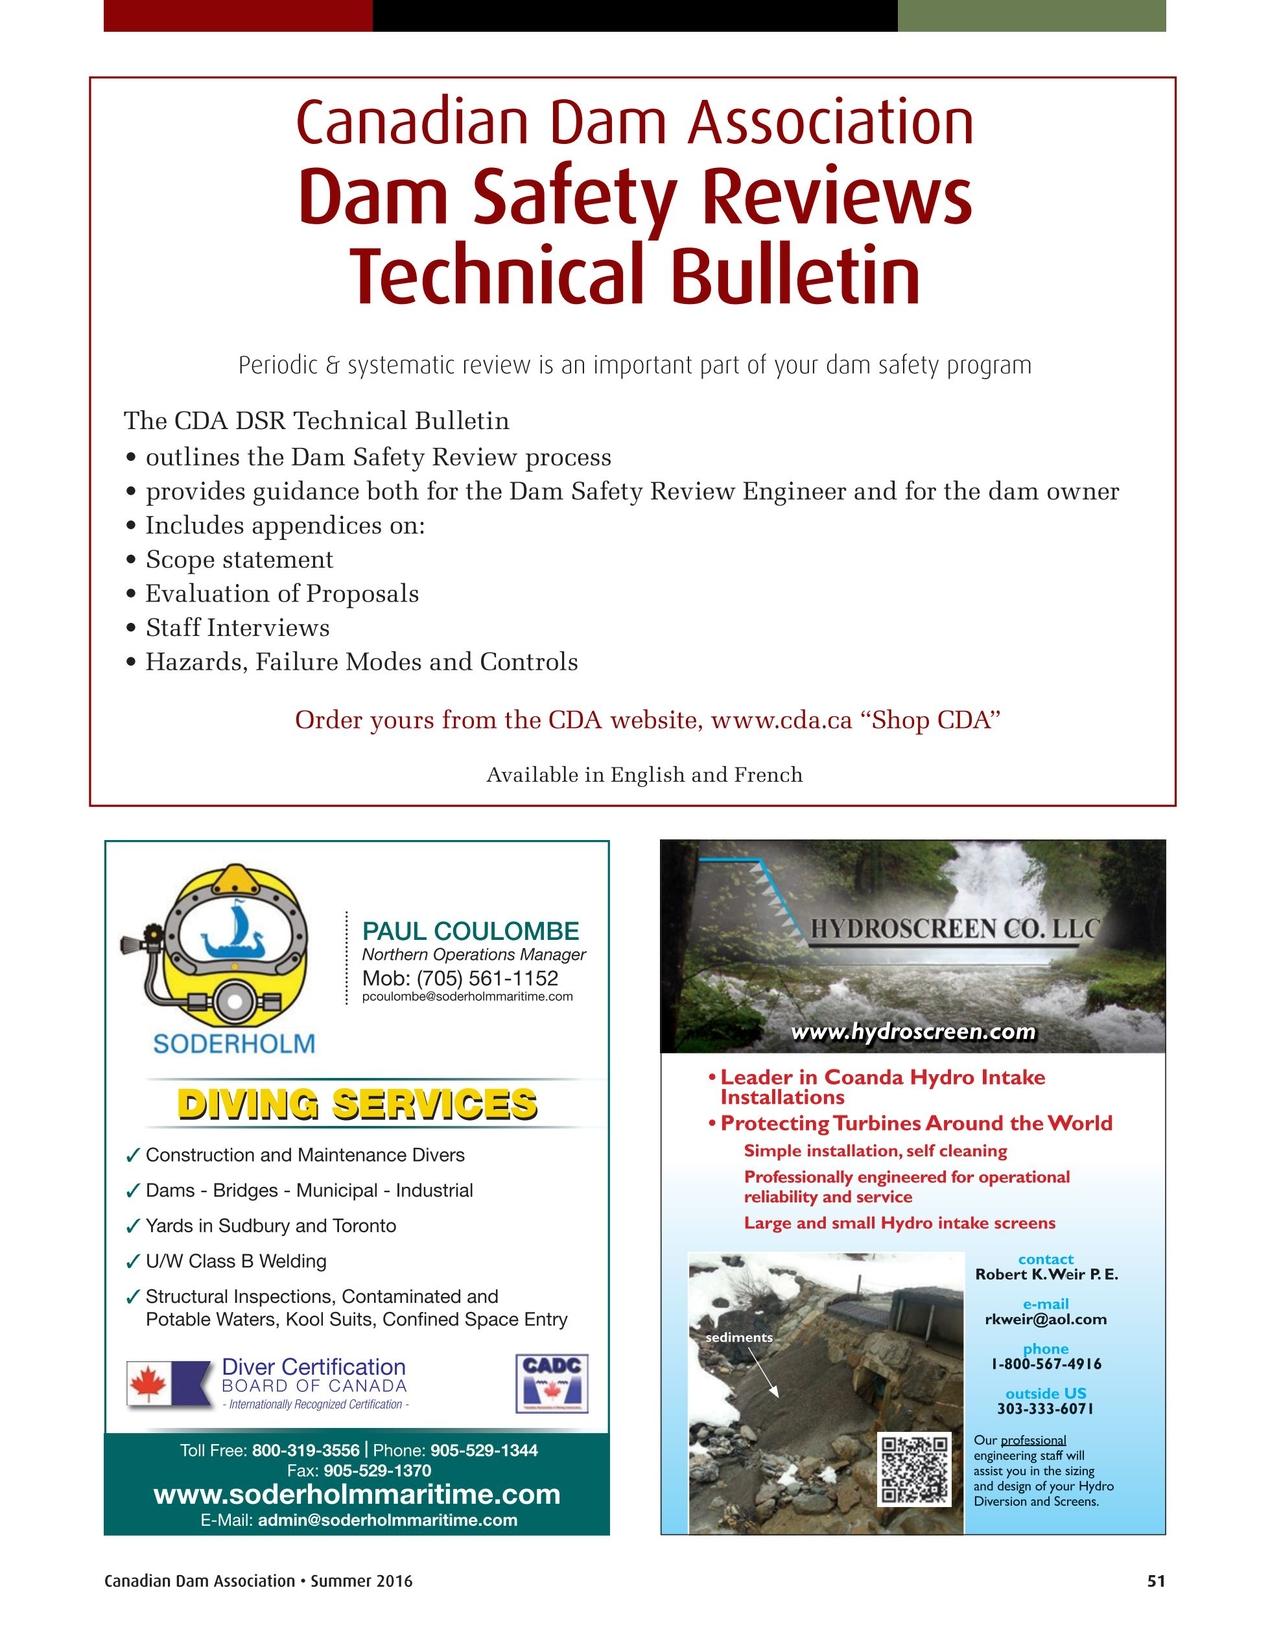 Canadian Dam Association Bulletin Summer 2016